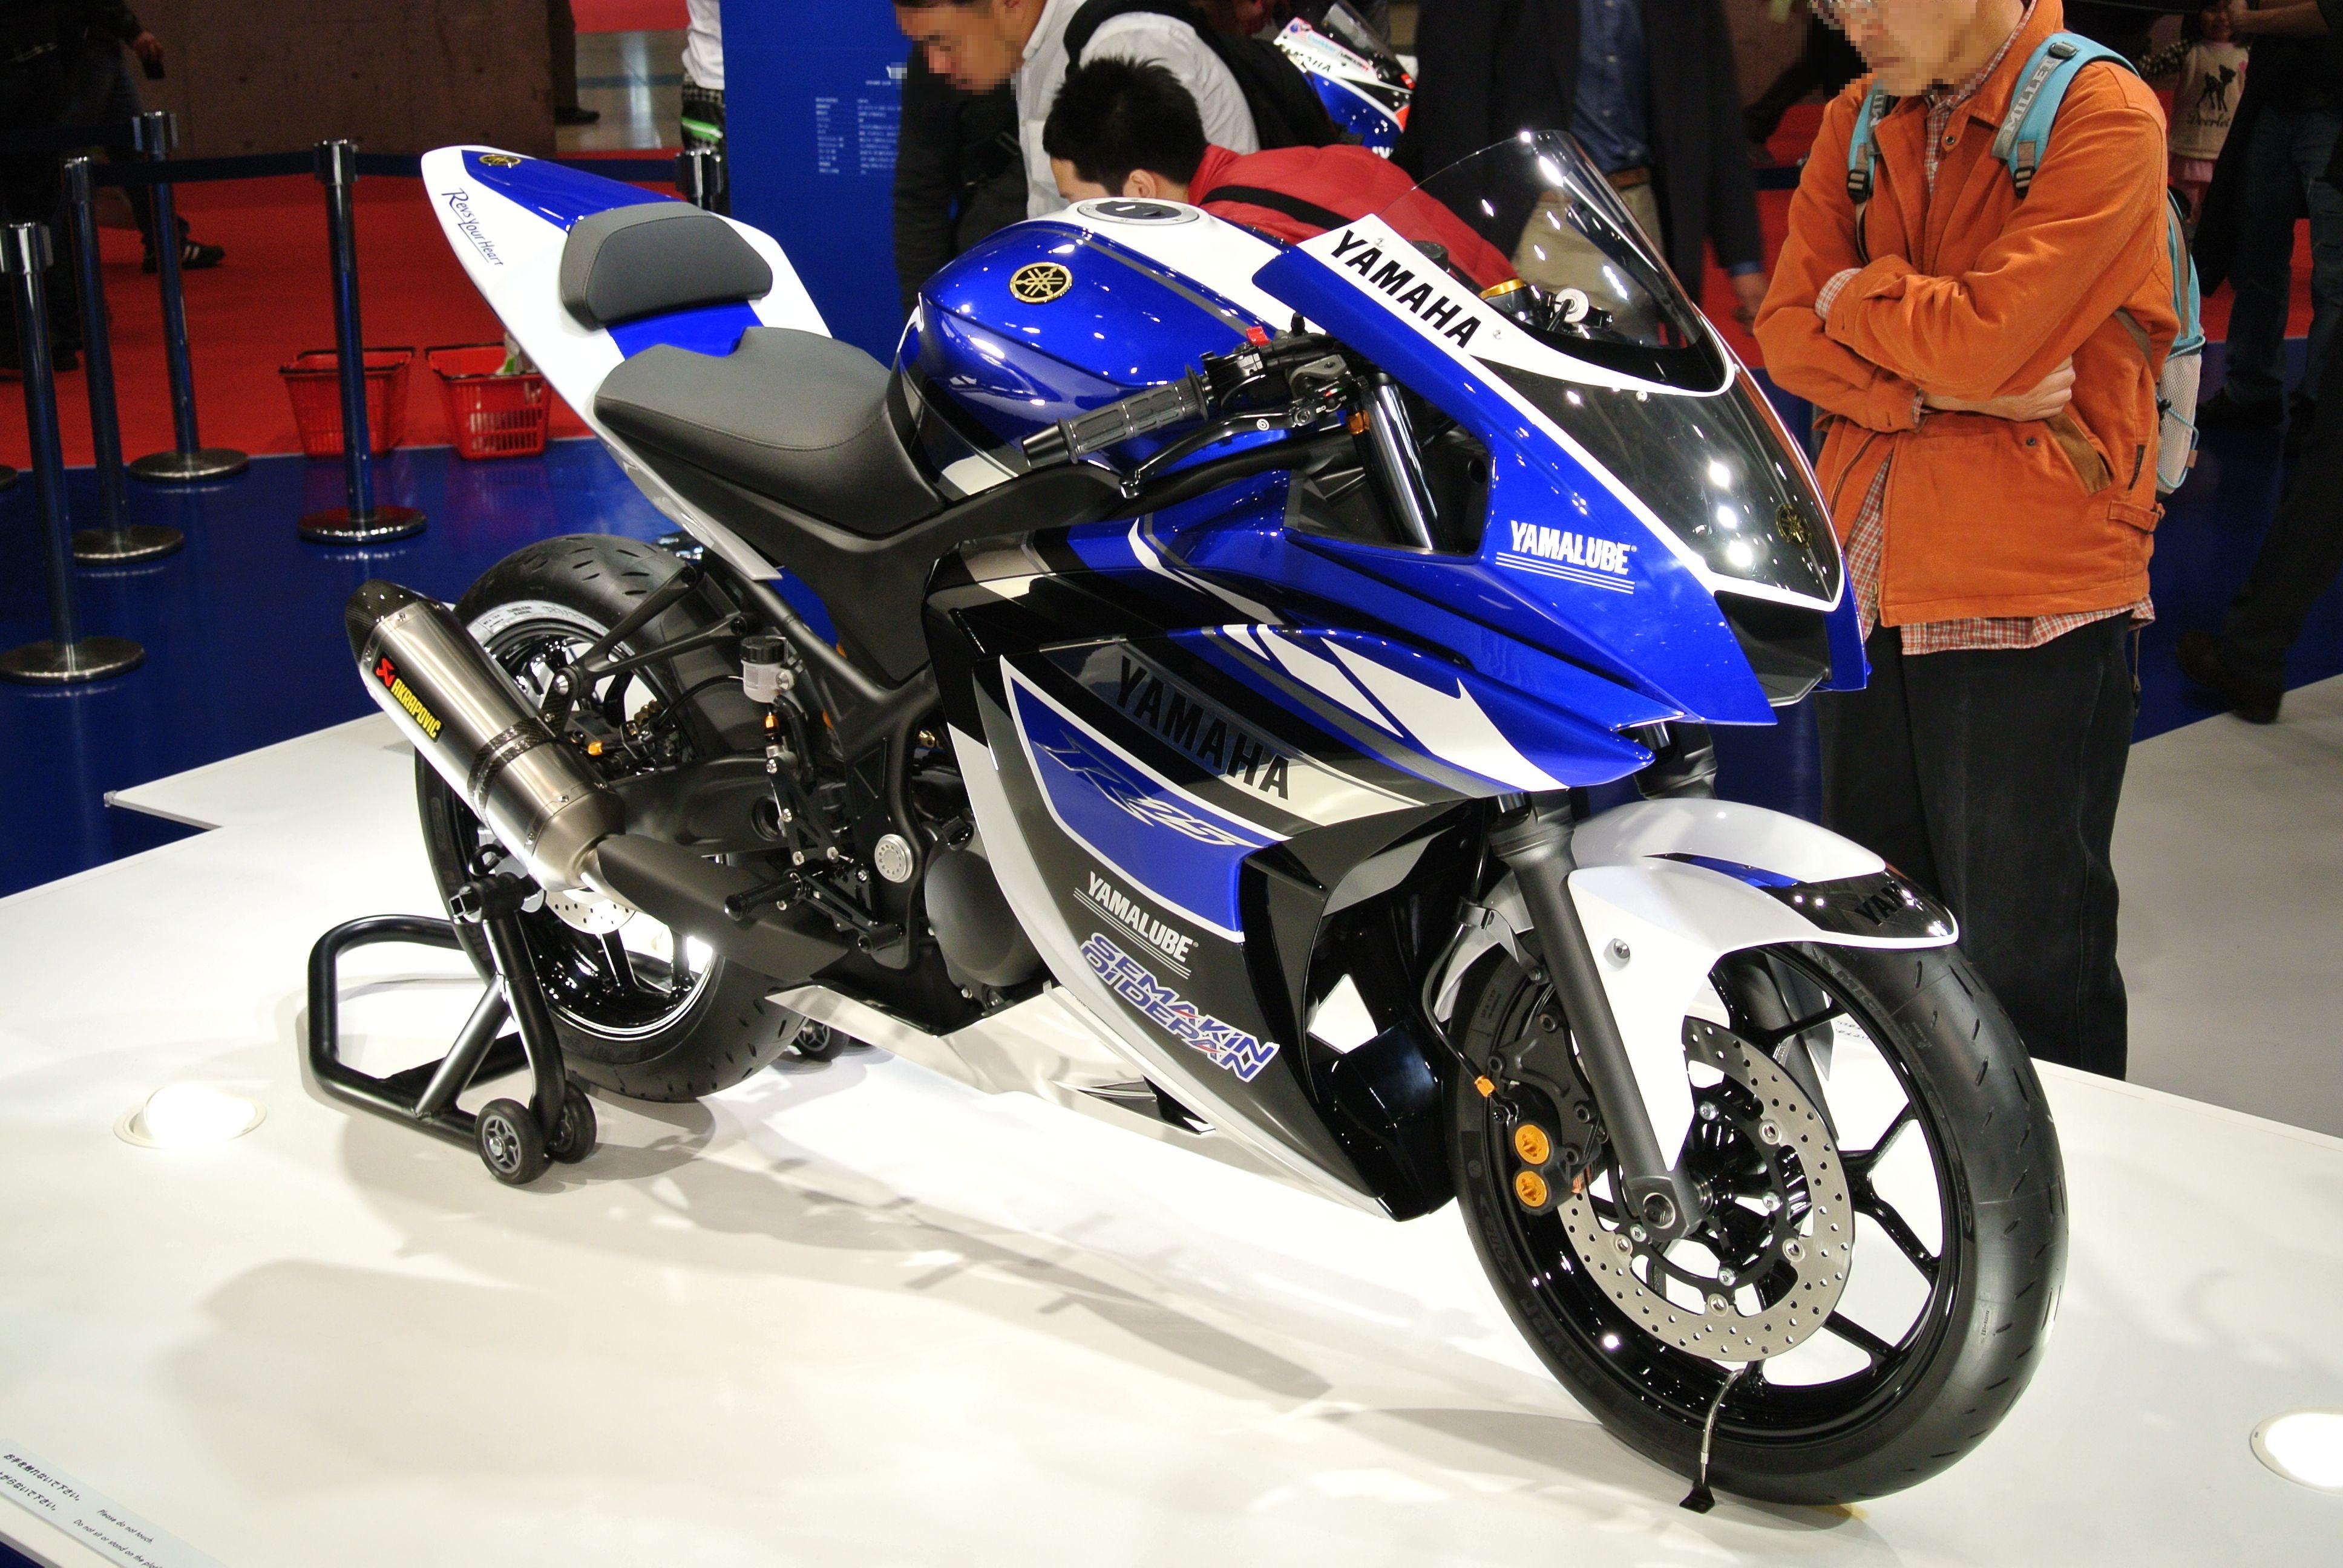 Berkas Yamaha Yzf R25 Tokyo Motor Show 2013 Jpg Wikipedia Bahasa